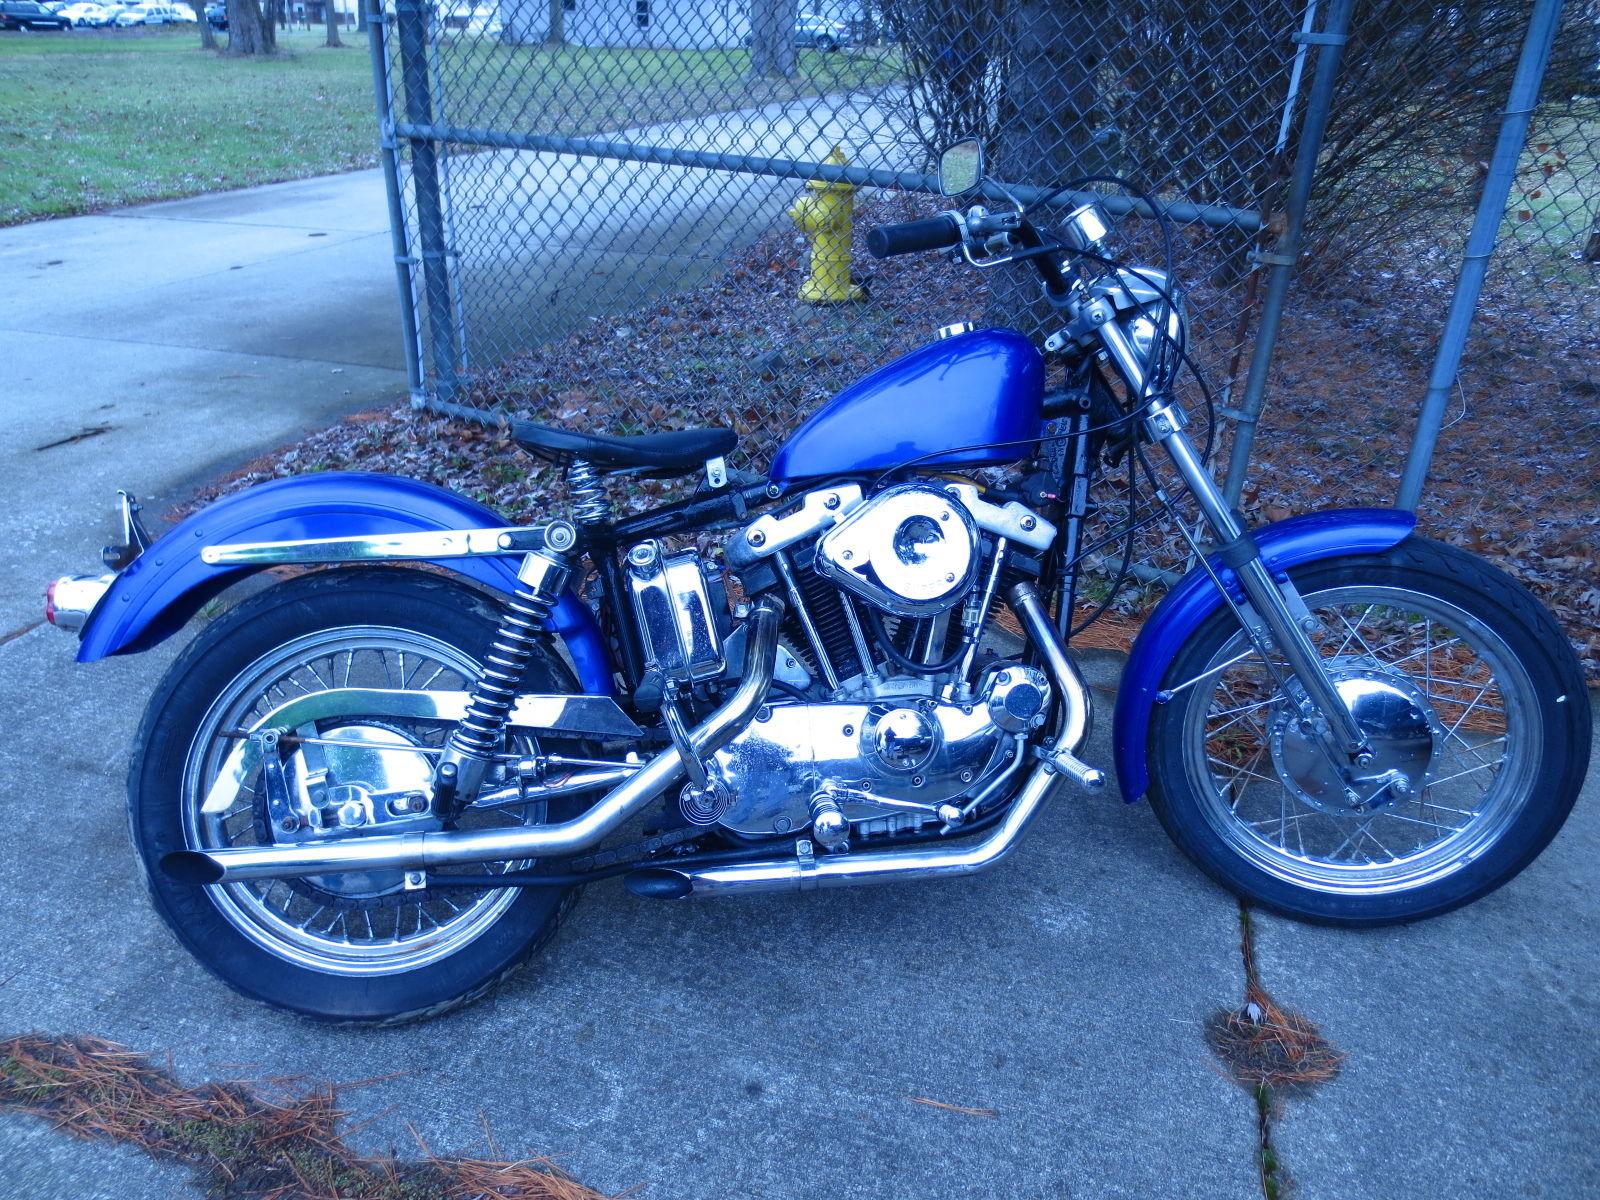 Harley Davidson Sportster Xlch Ironhead Sportster on Sportster Transmission Parts